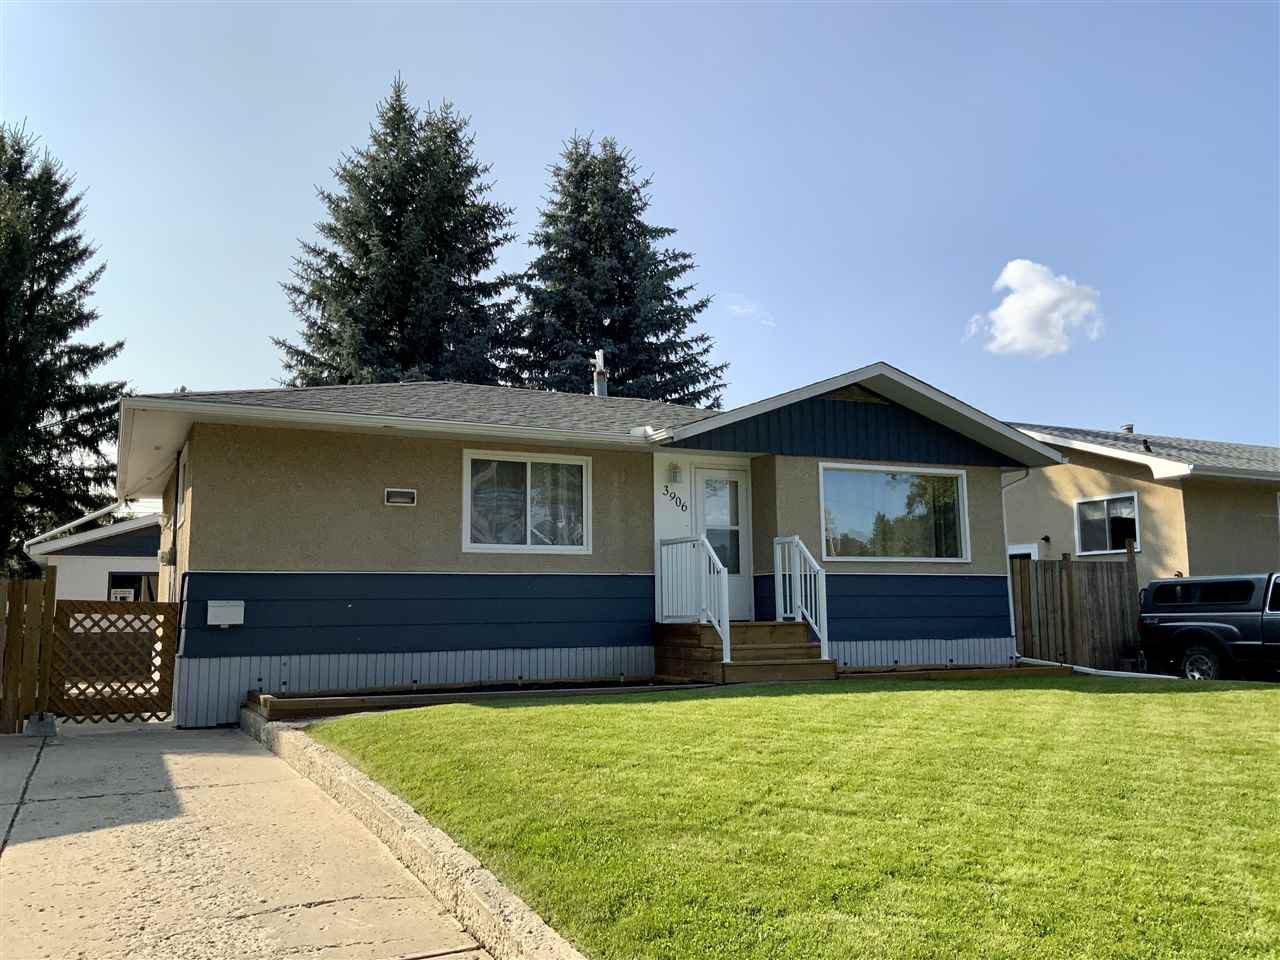 Main Photo: 3906 52 Street: Wetaskiwin House for sale : MLS®# E4213303